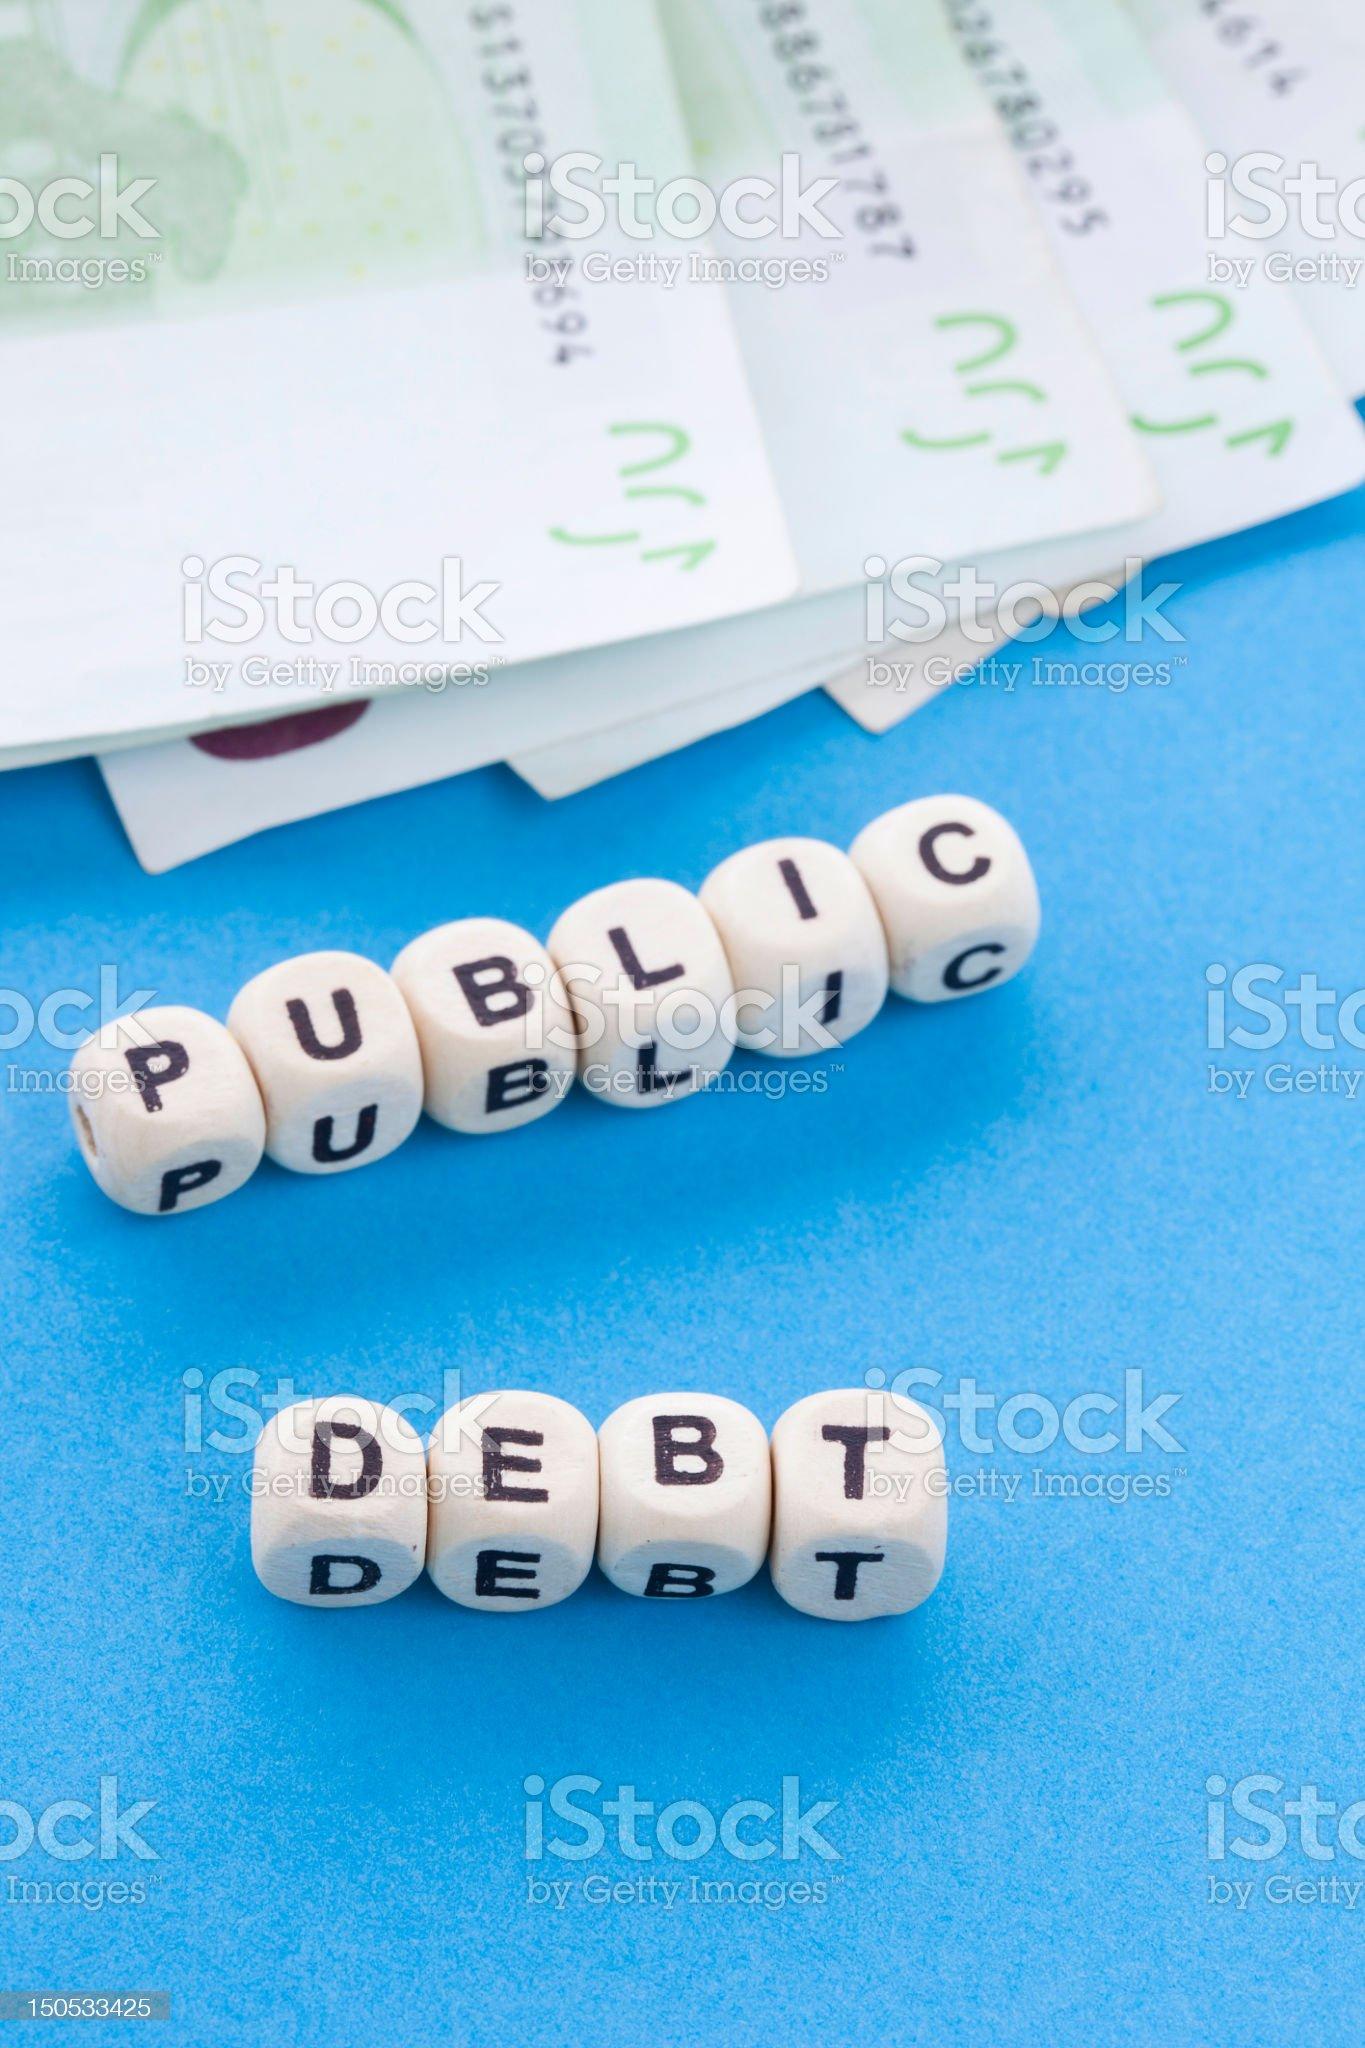 Public Debt - Crossword Puzzle royalty-free stock photo